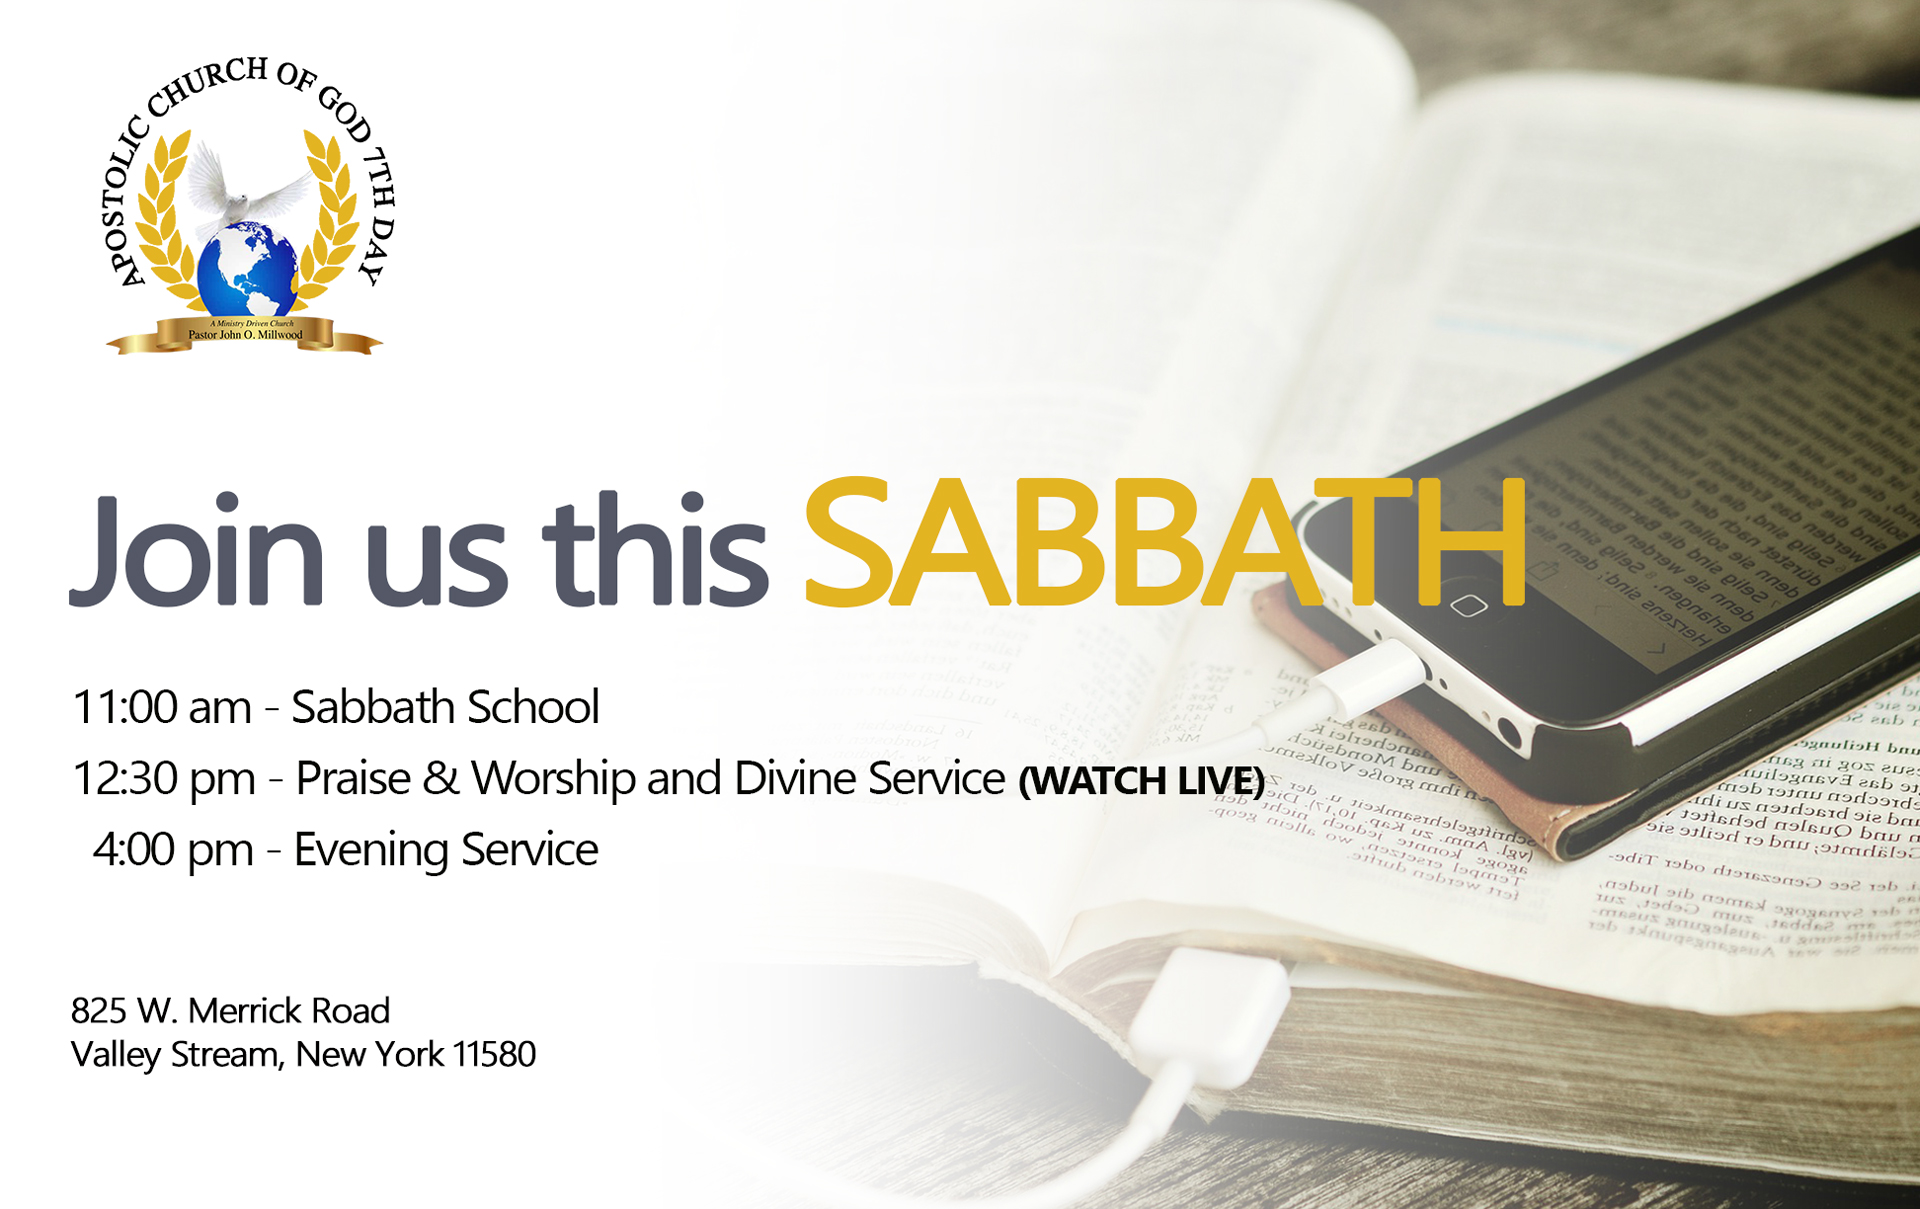 Apostolic Sabbath Services